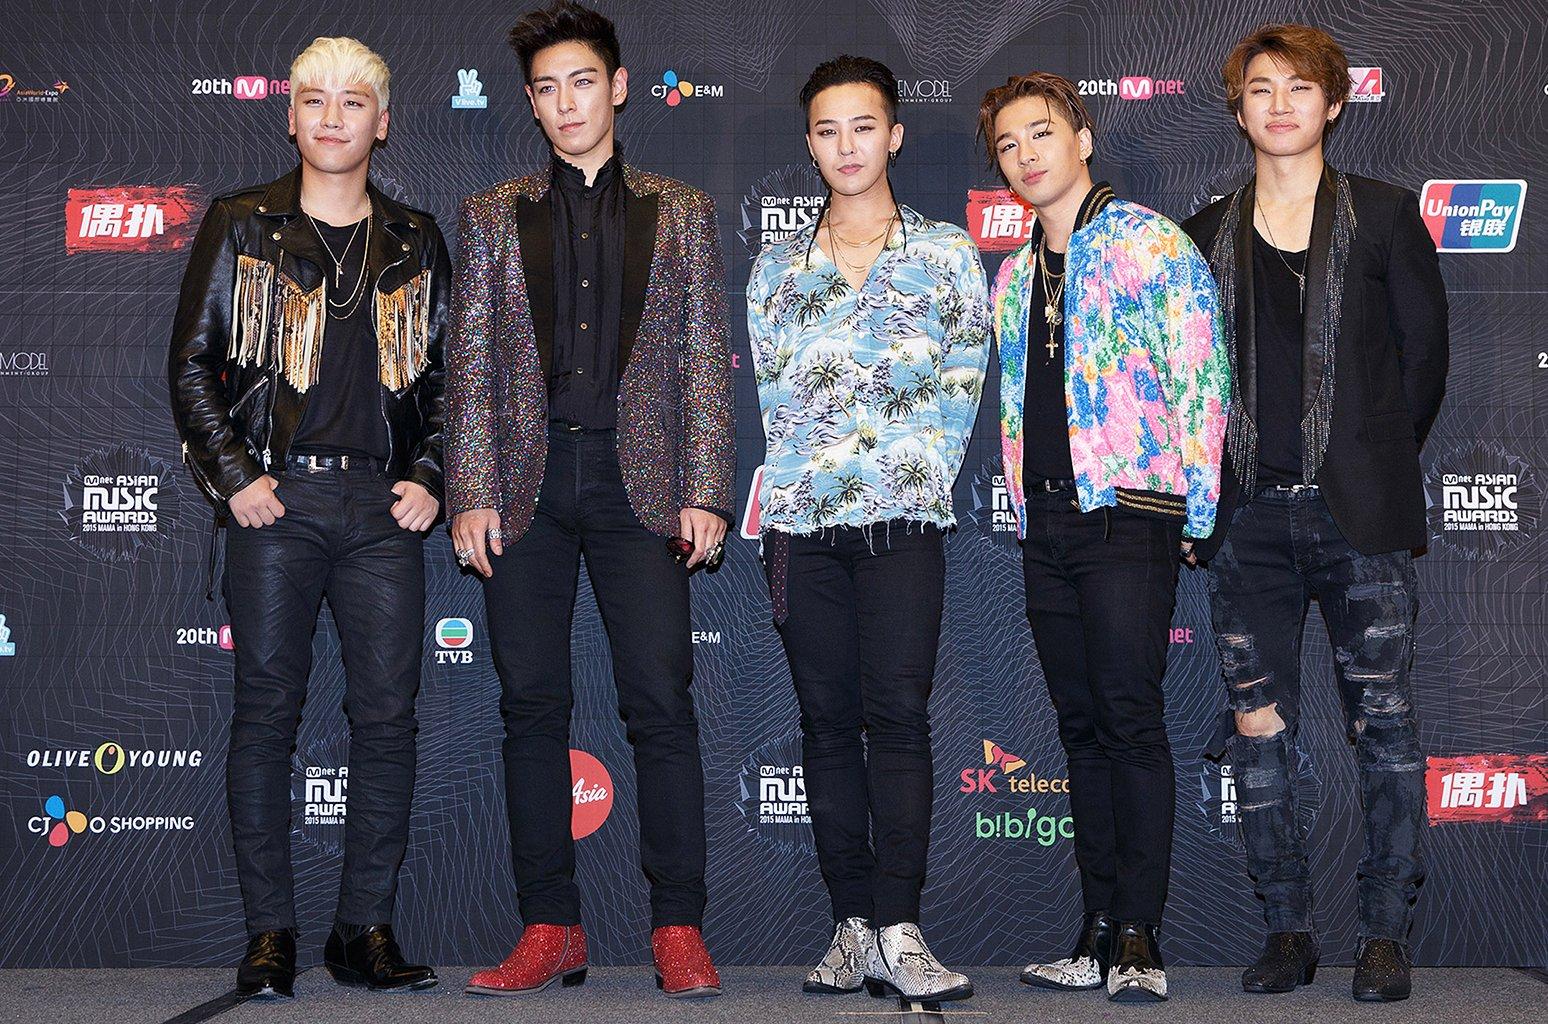 K-Pop icons BIGBANG walk the 'Flower Road' in final single before hiatus https://t.co/eLjmHeyW9O https://t.co/RO3DBOOk9I